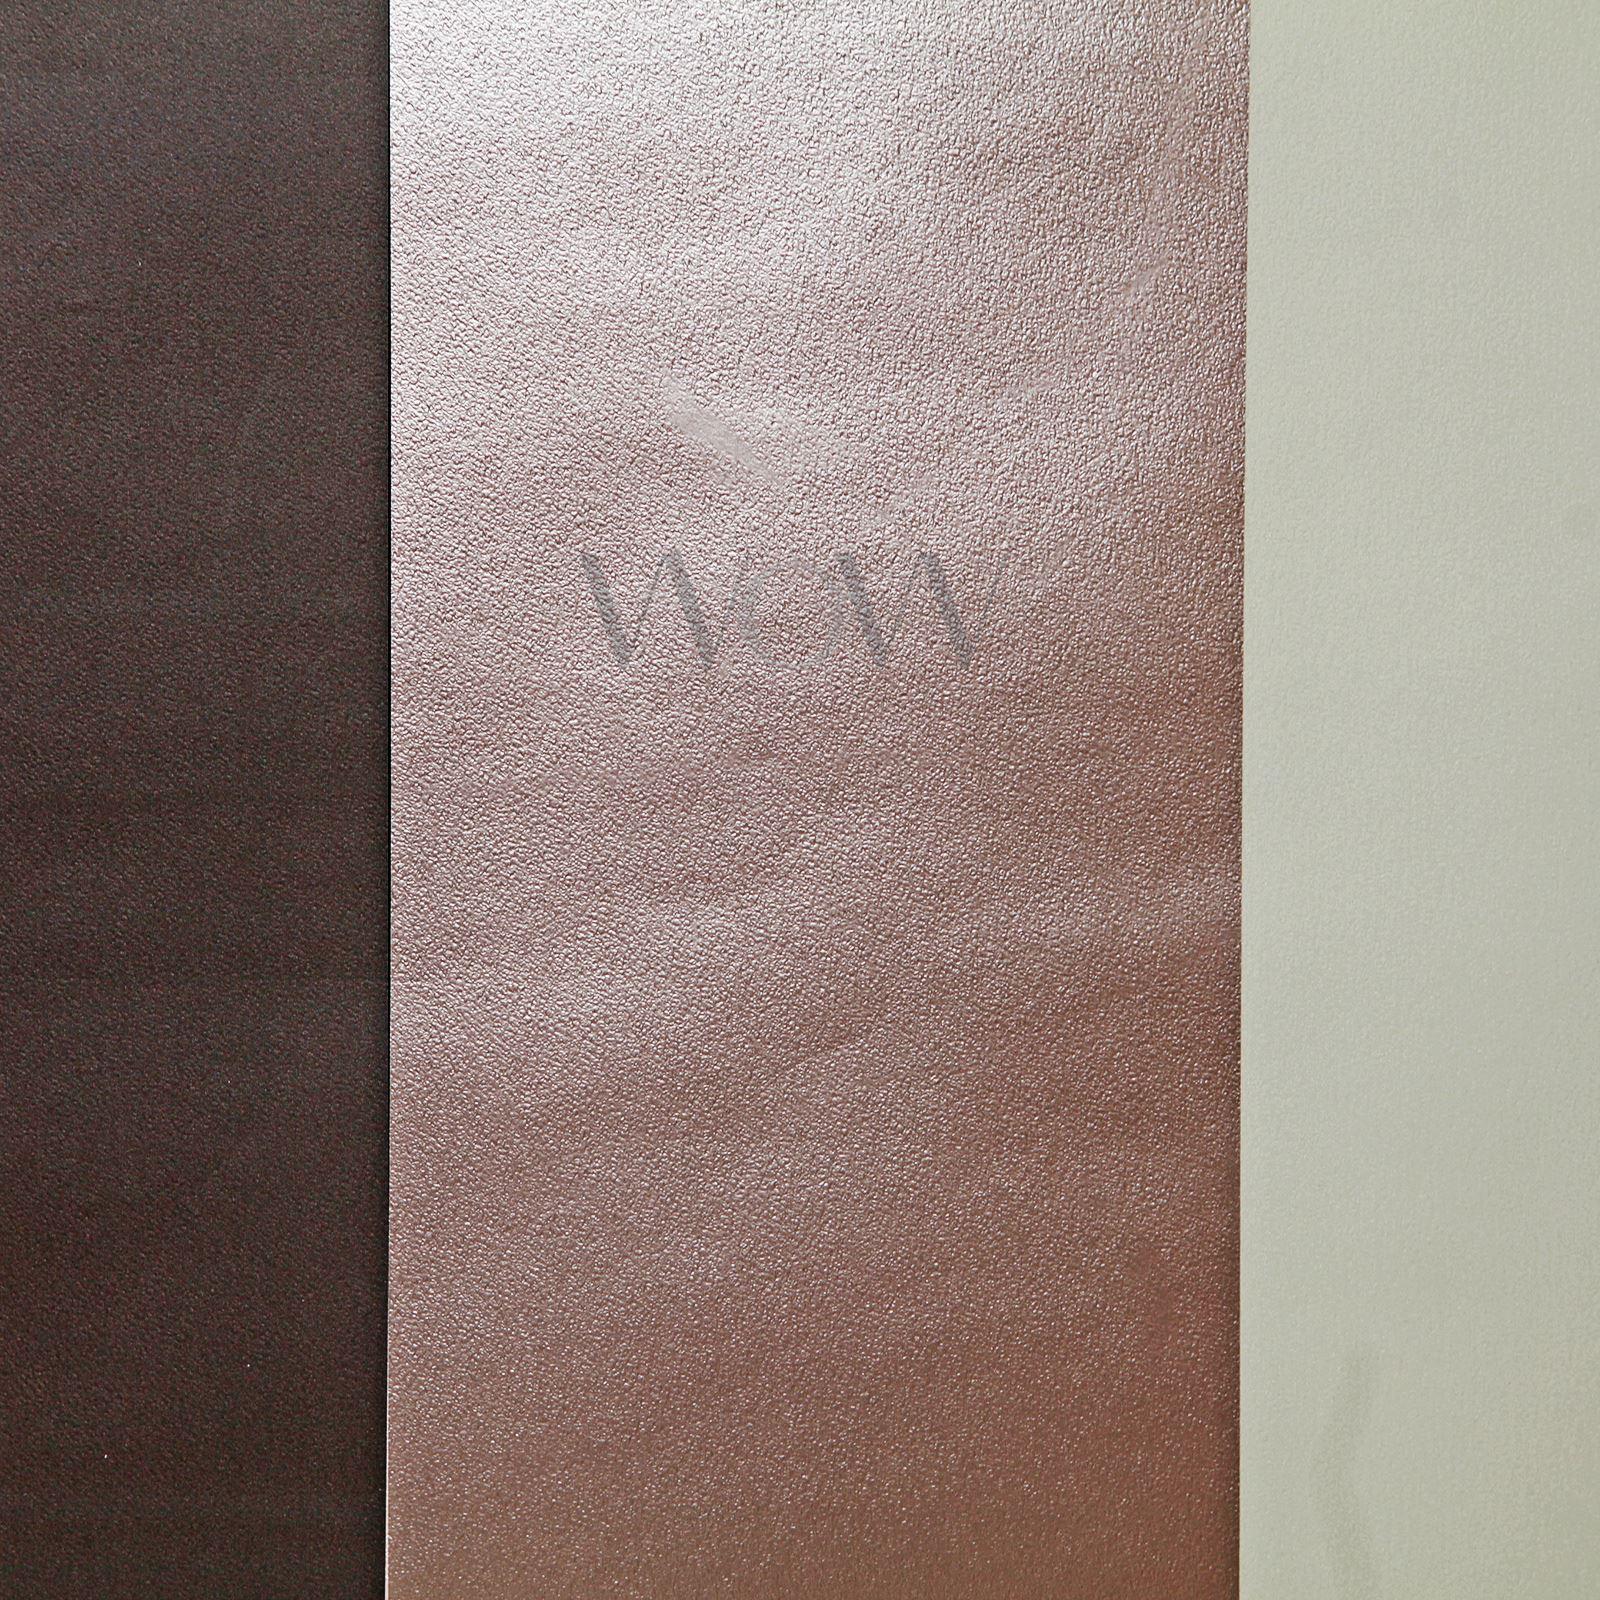 kupfer dunkelgrau tapete glitzer metallisch federn. Black Bedroom Furniture Sets. Home Design Ideas